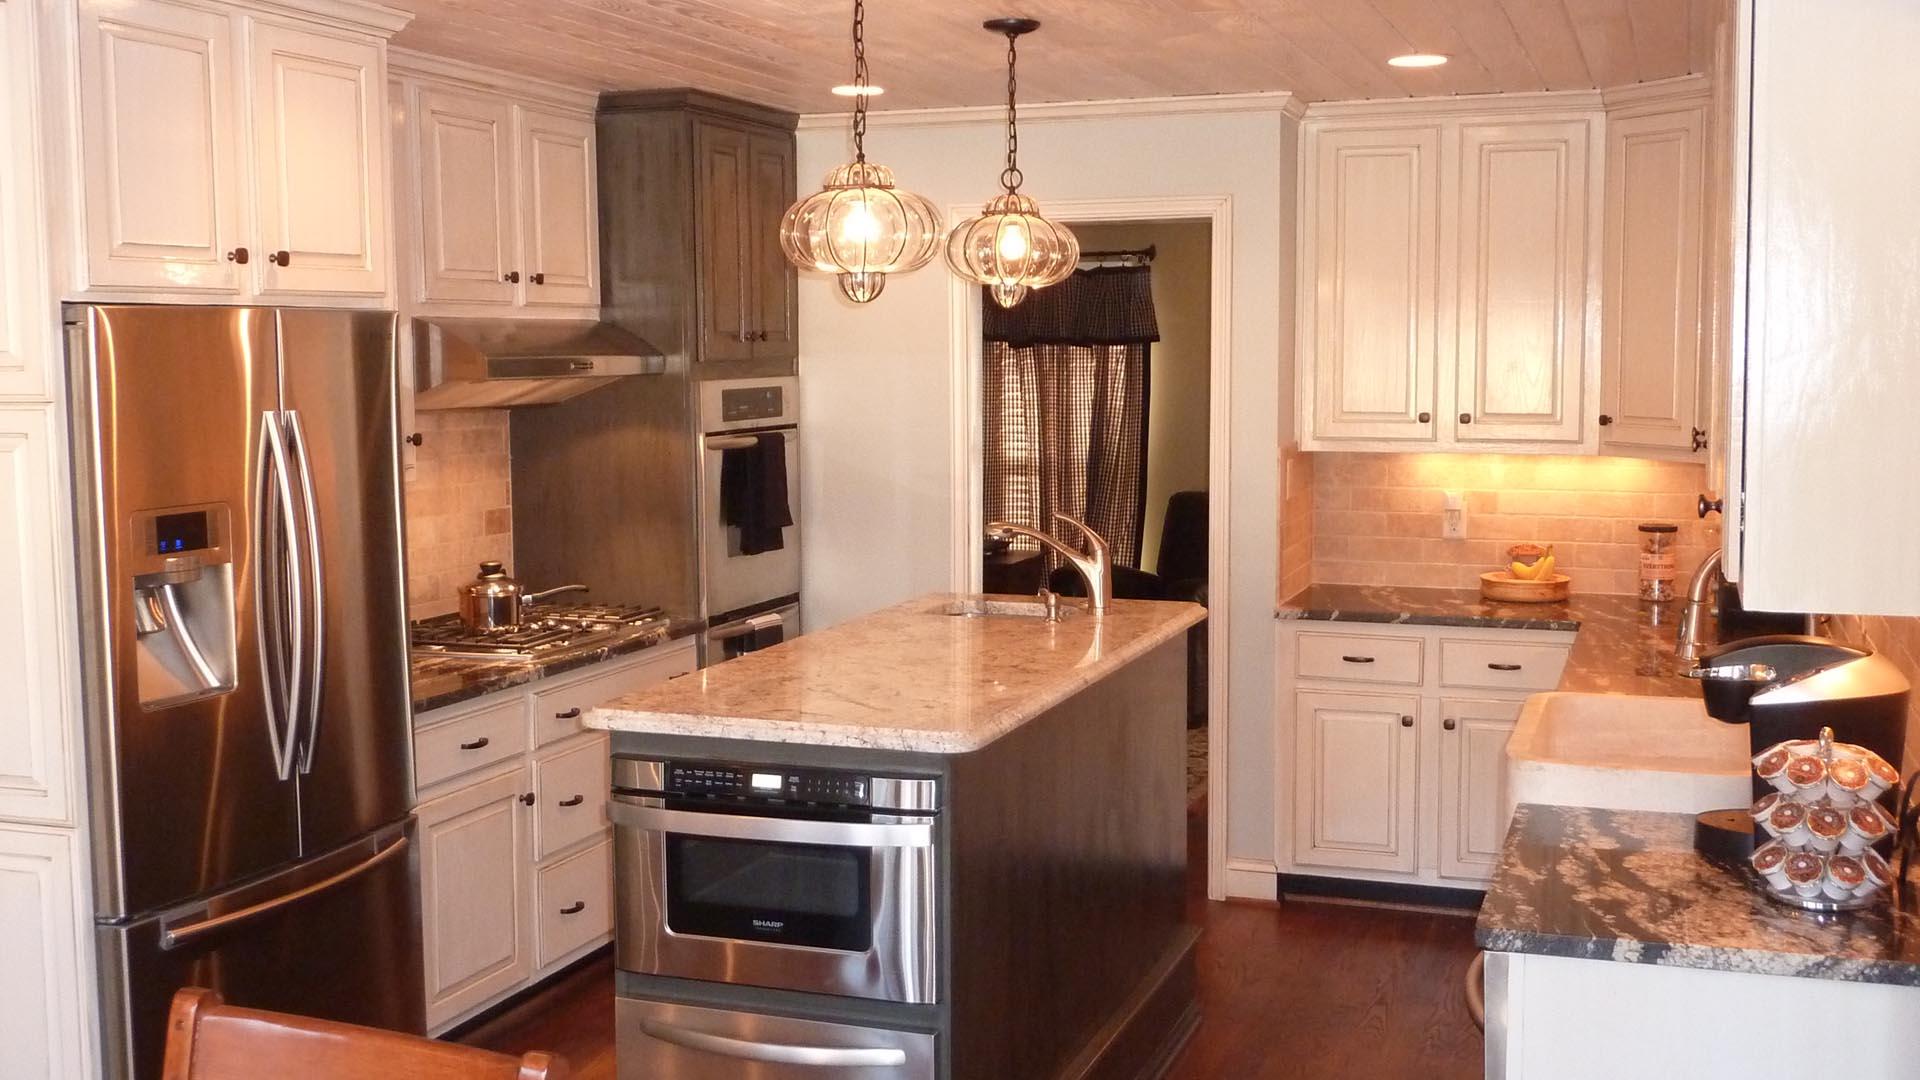 Residential Remodeling | Marietta Exterior Remodeling, Interior ...